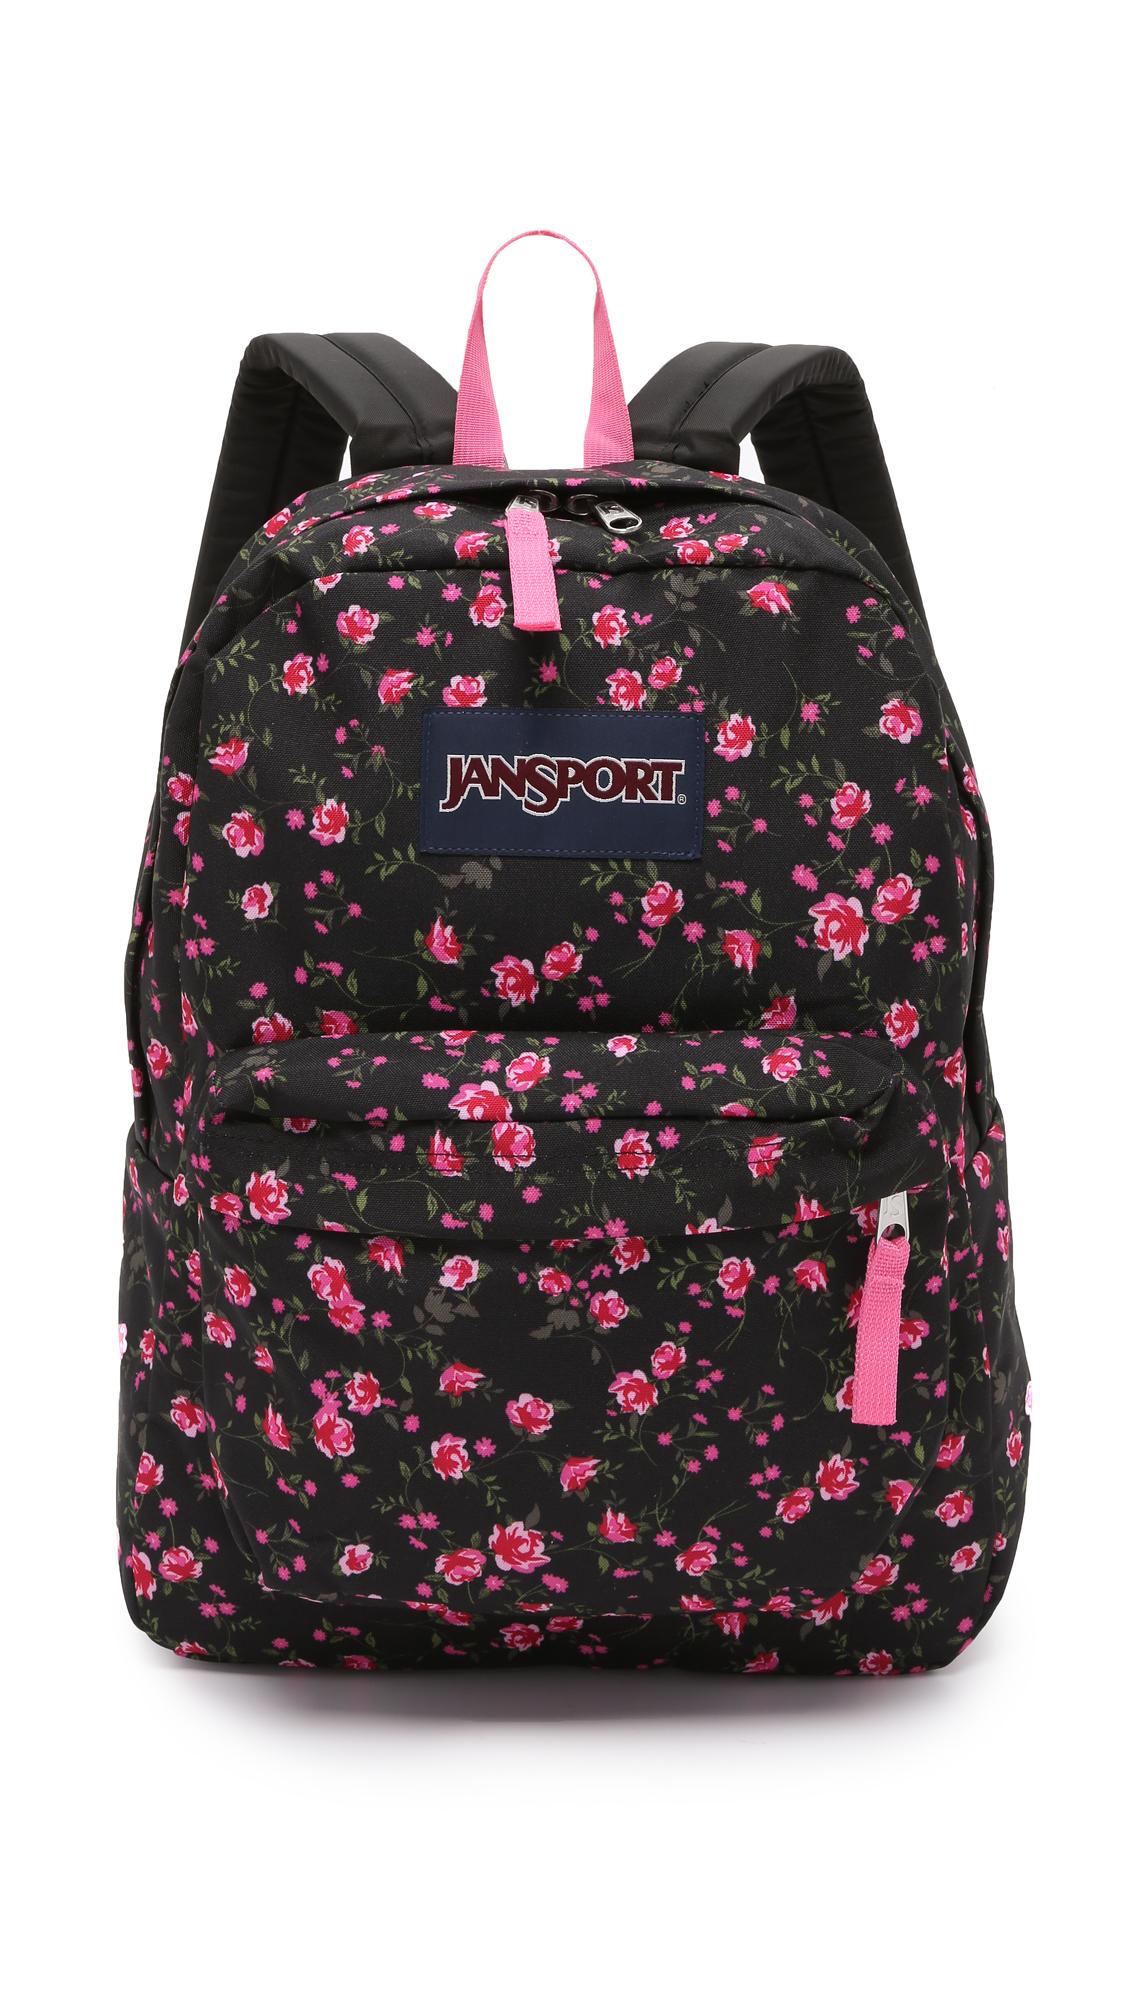 jansport backpacks black and pink wwwpixsharkcom